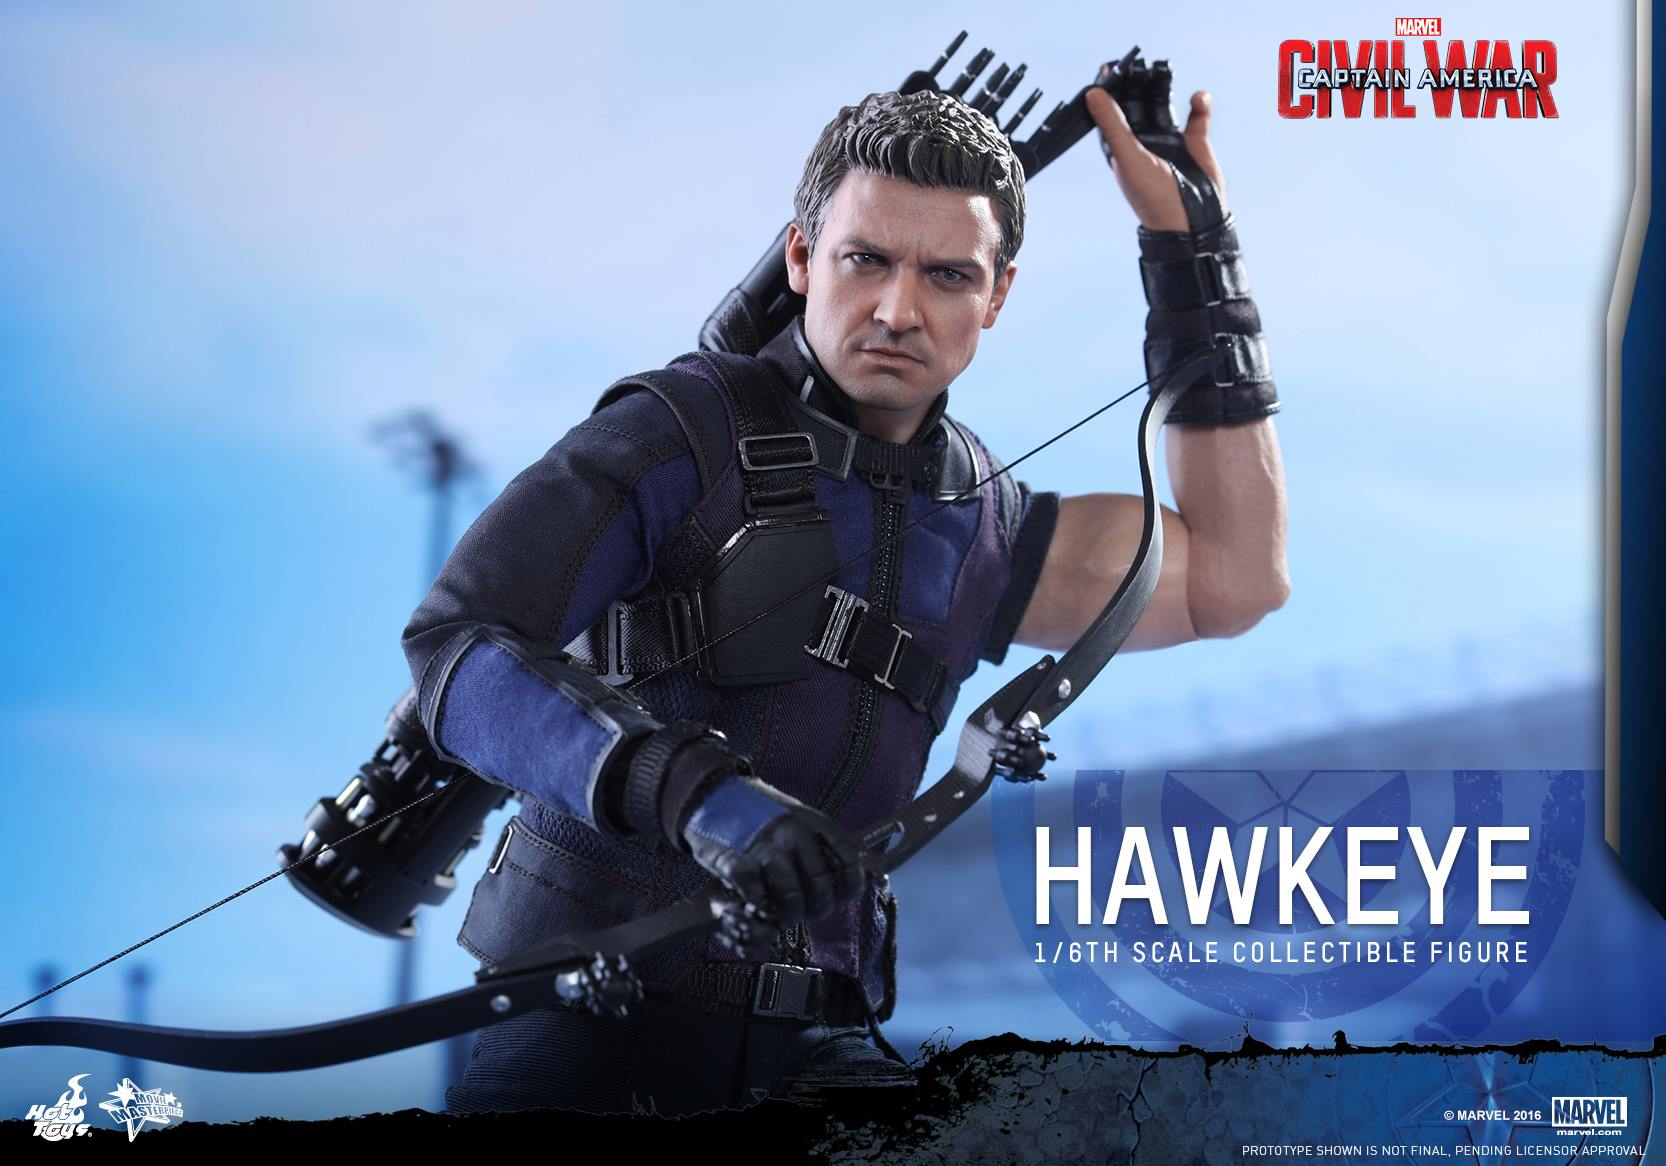 Hot Toys Captain America: Civil War Hawkeye Sixth Scale Figure